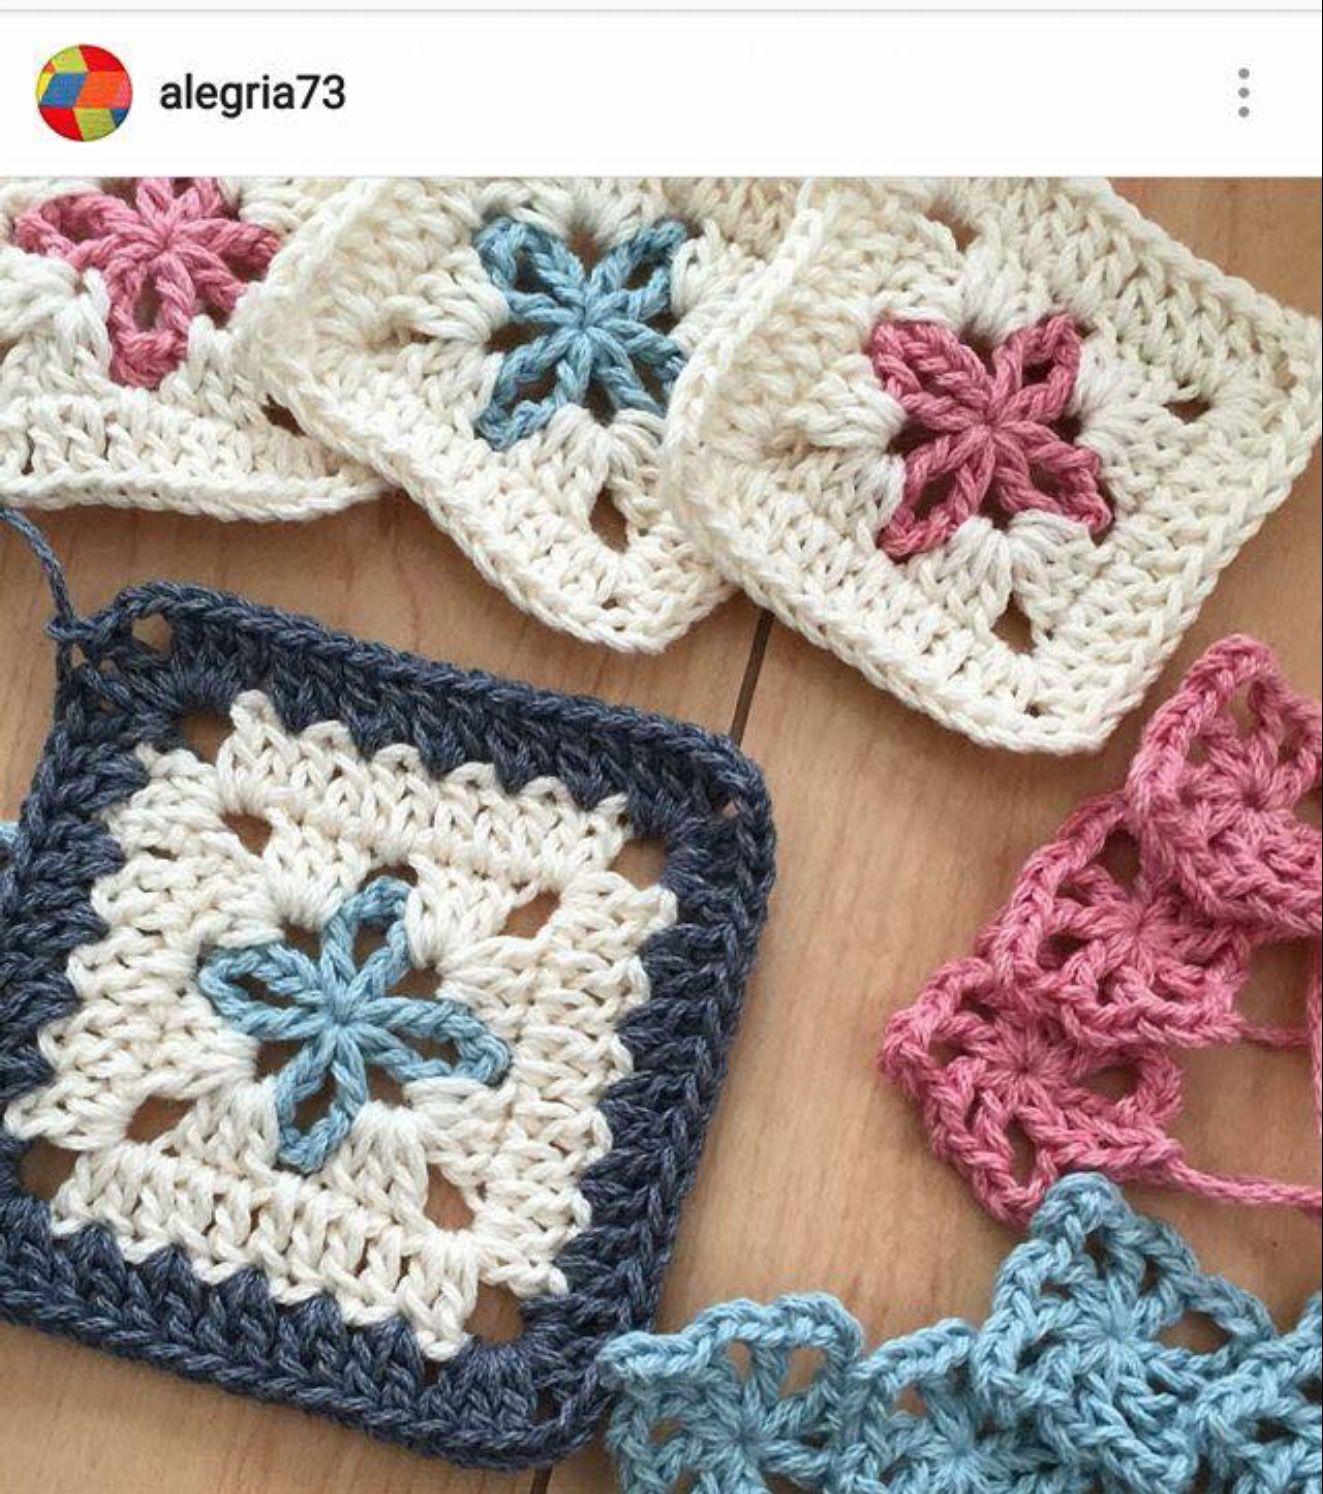 Crochet square motif | crochet | Pinterest | Crochet squares ...